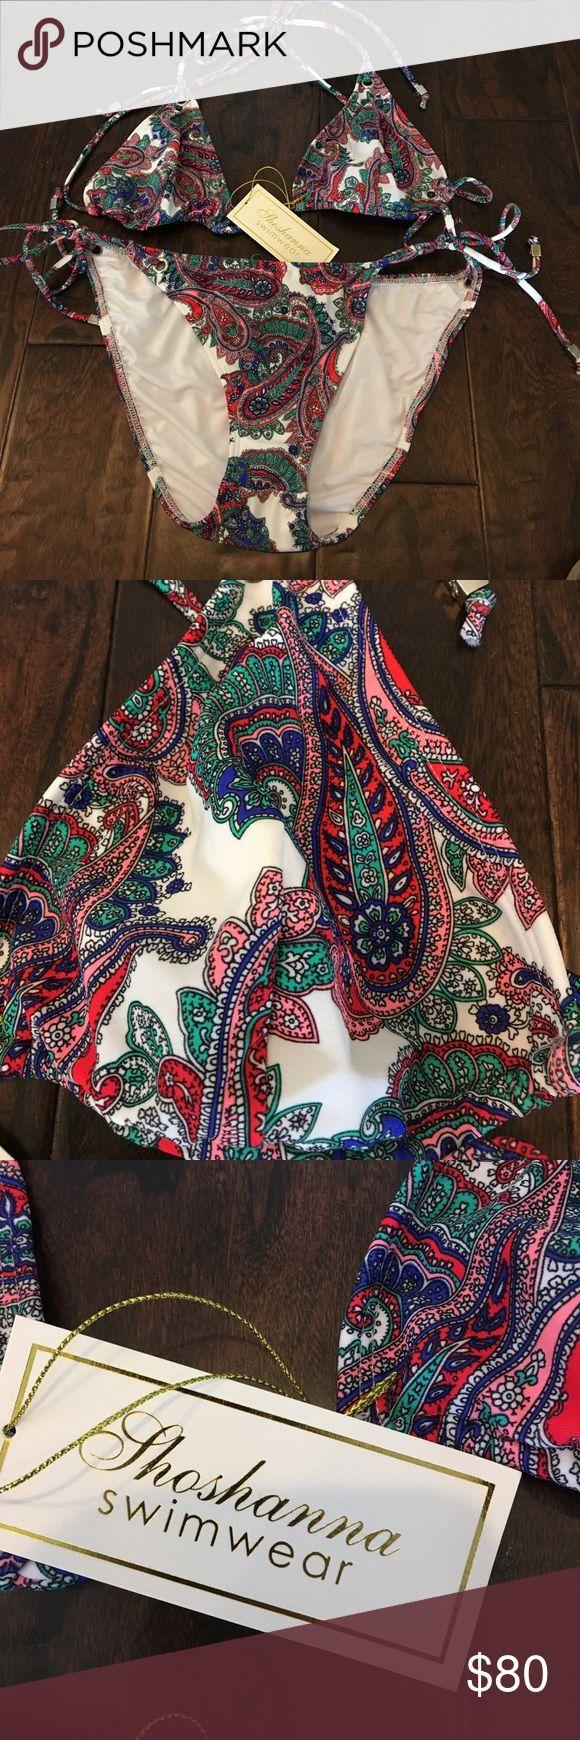 NWT Shoshanna Triangle bikini - L/ Top is D/DD Brand New with tags's Shoshanna triangle bikini features silver accents. Bottom is size large top is a D or DD cup Shoshanna Swim Bikinis